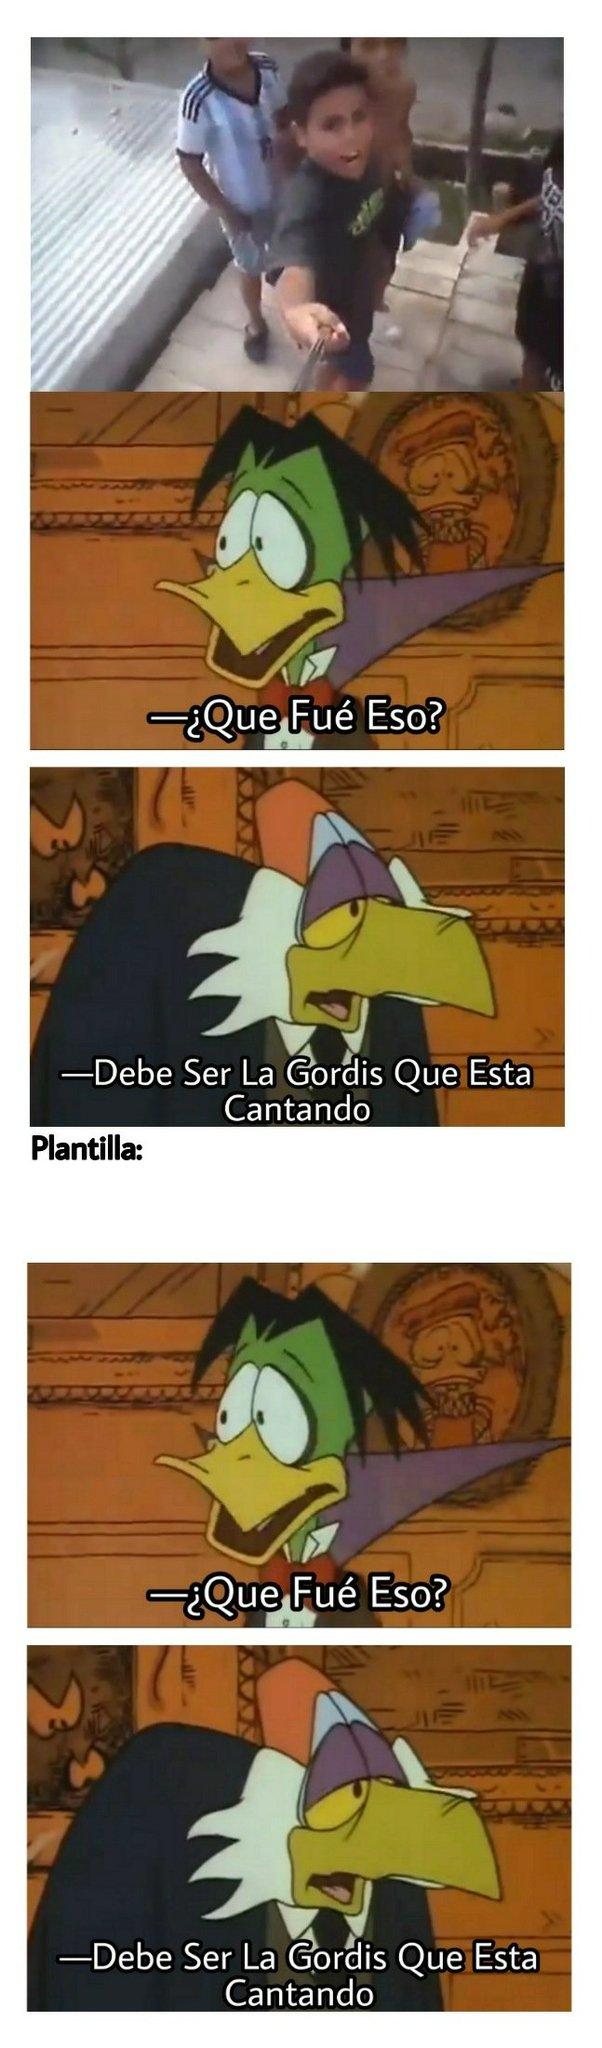 El Conde Pátula - meme